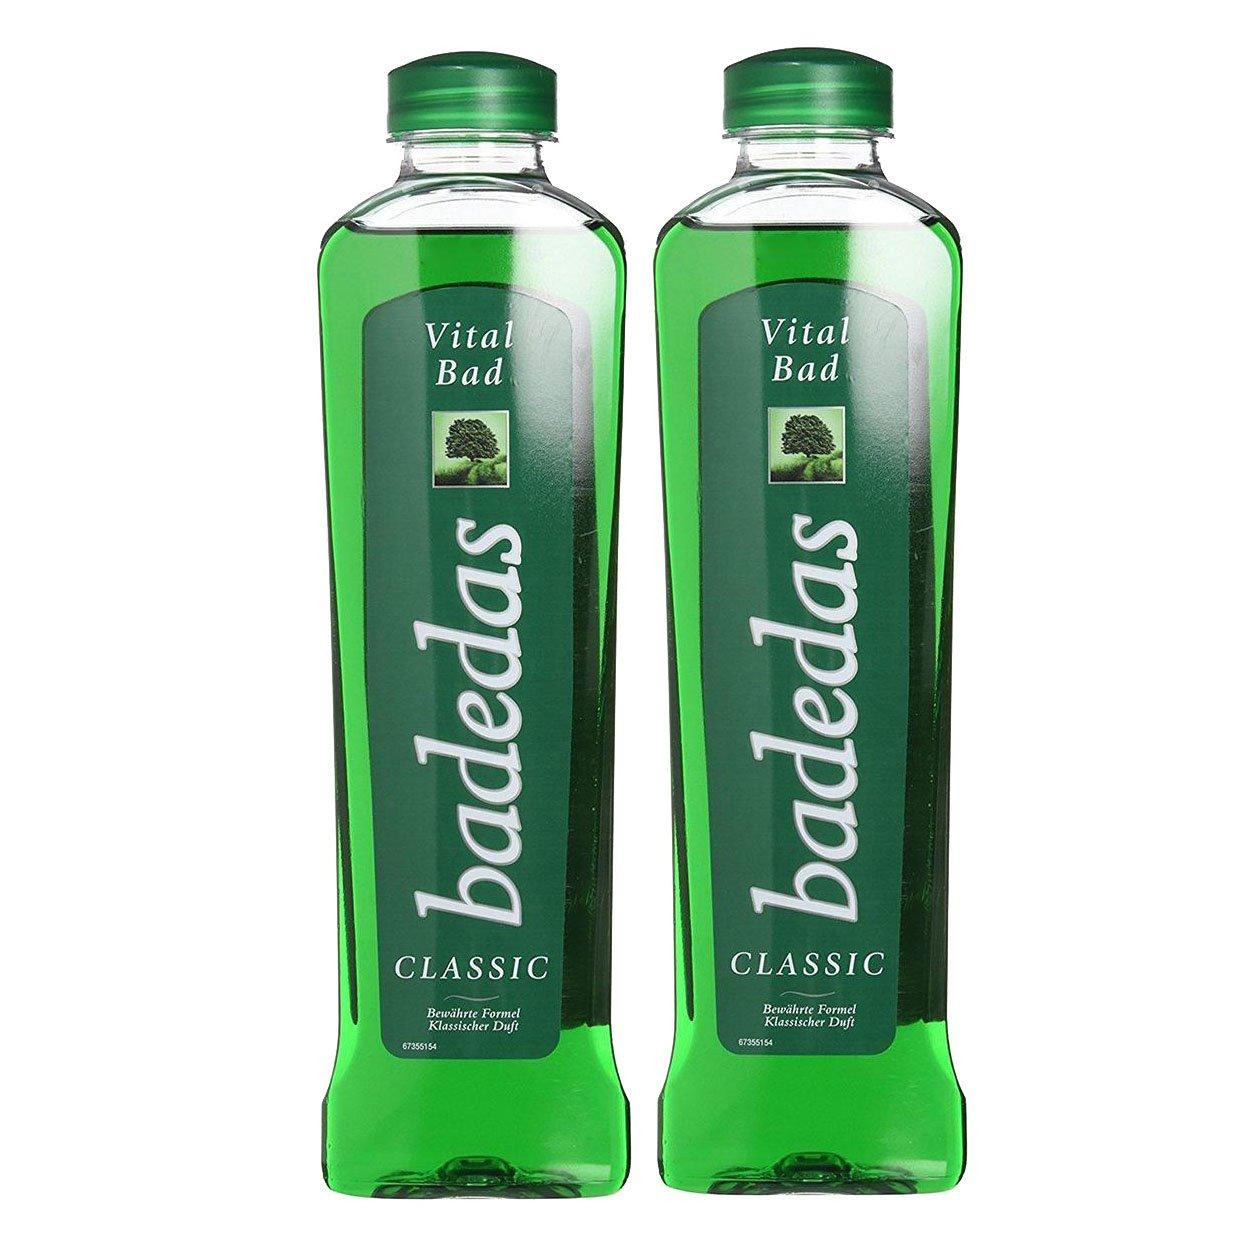 Badedas Classic Vital Bad Bath Gel 2 pack